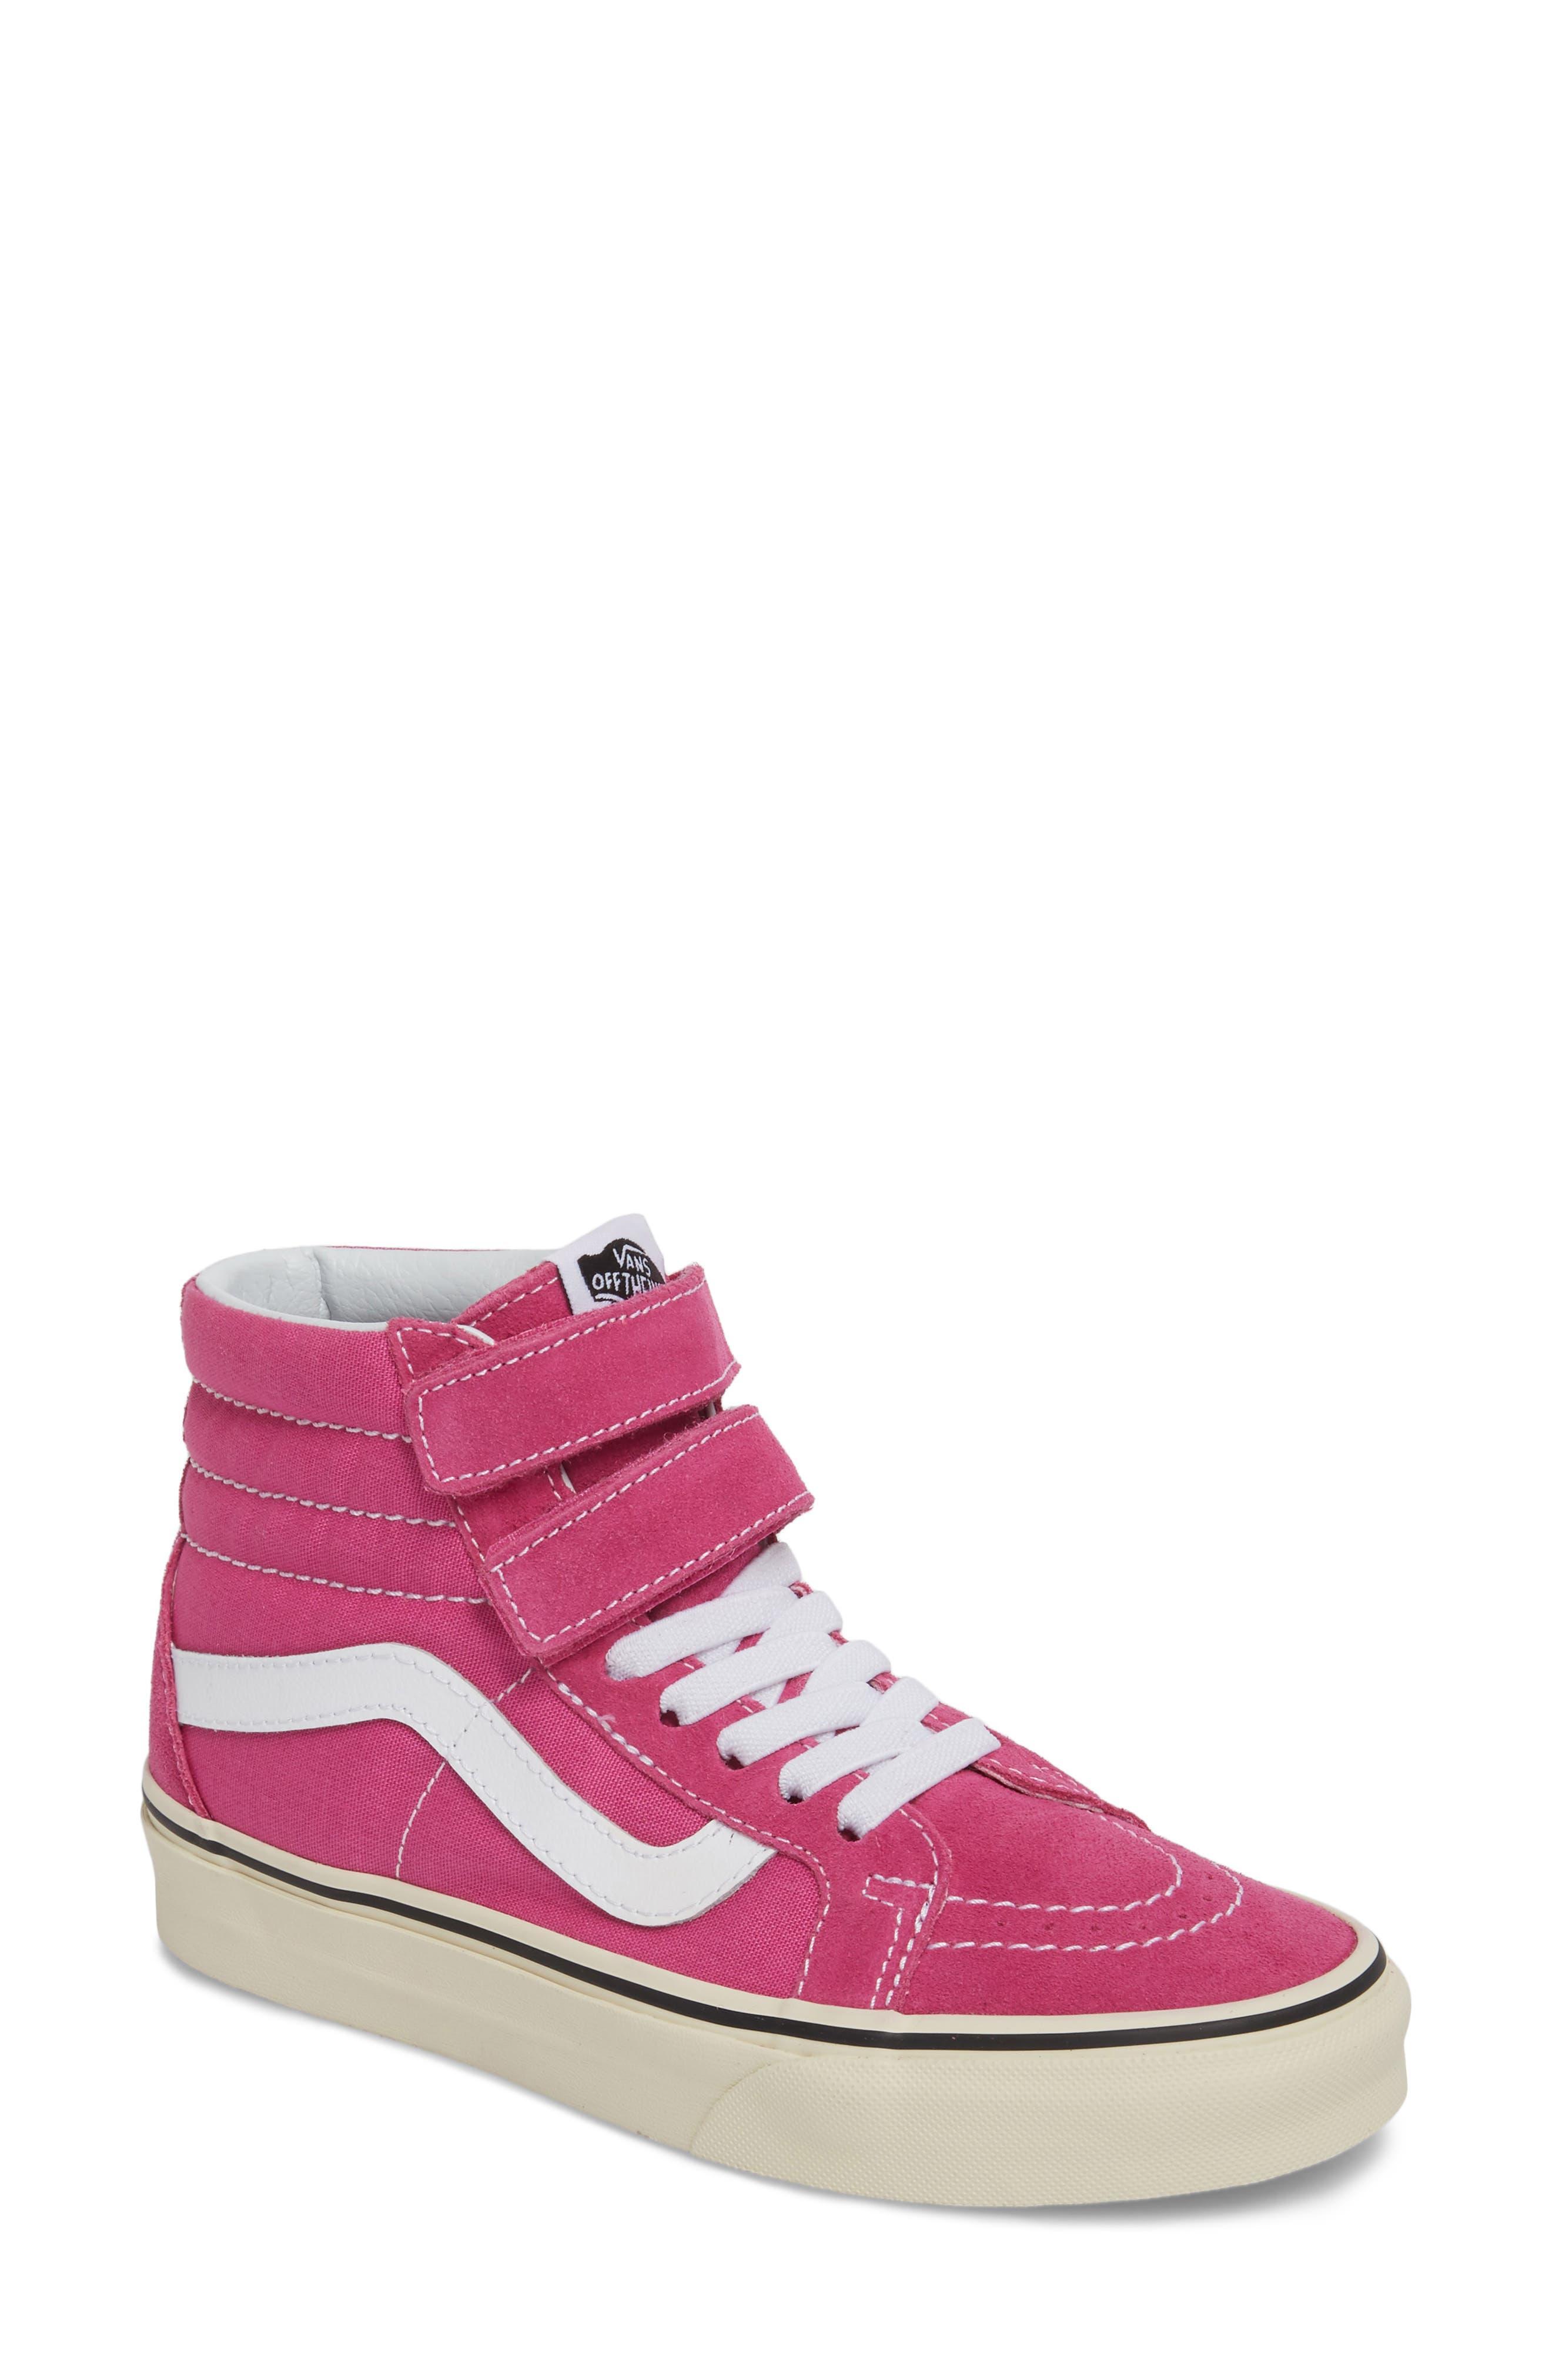 Sk8-Hi Reissue Sneaker,                         Main,                         color, Raspberry Rose/ Turtledove